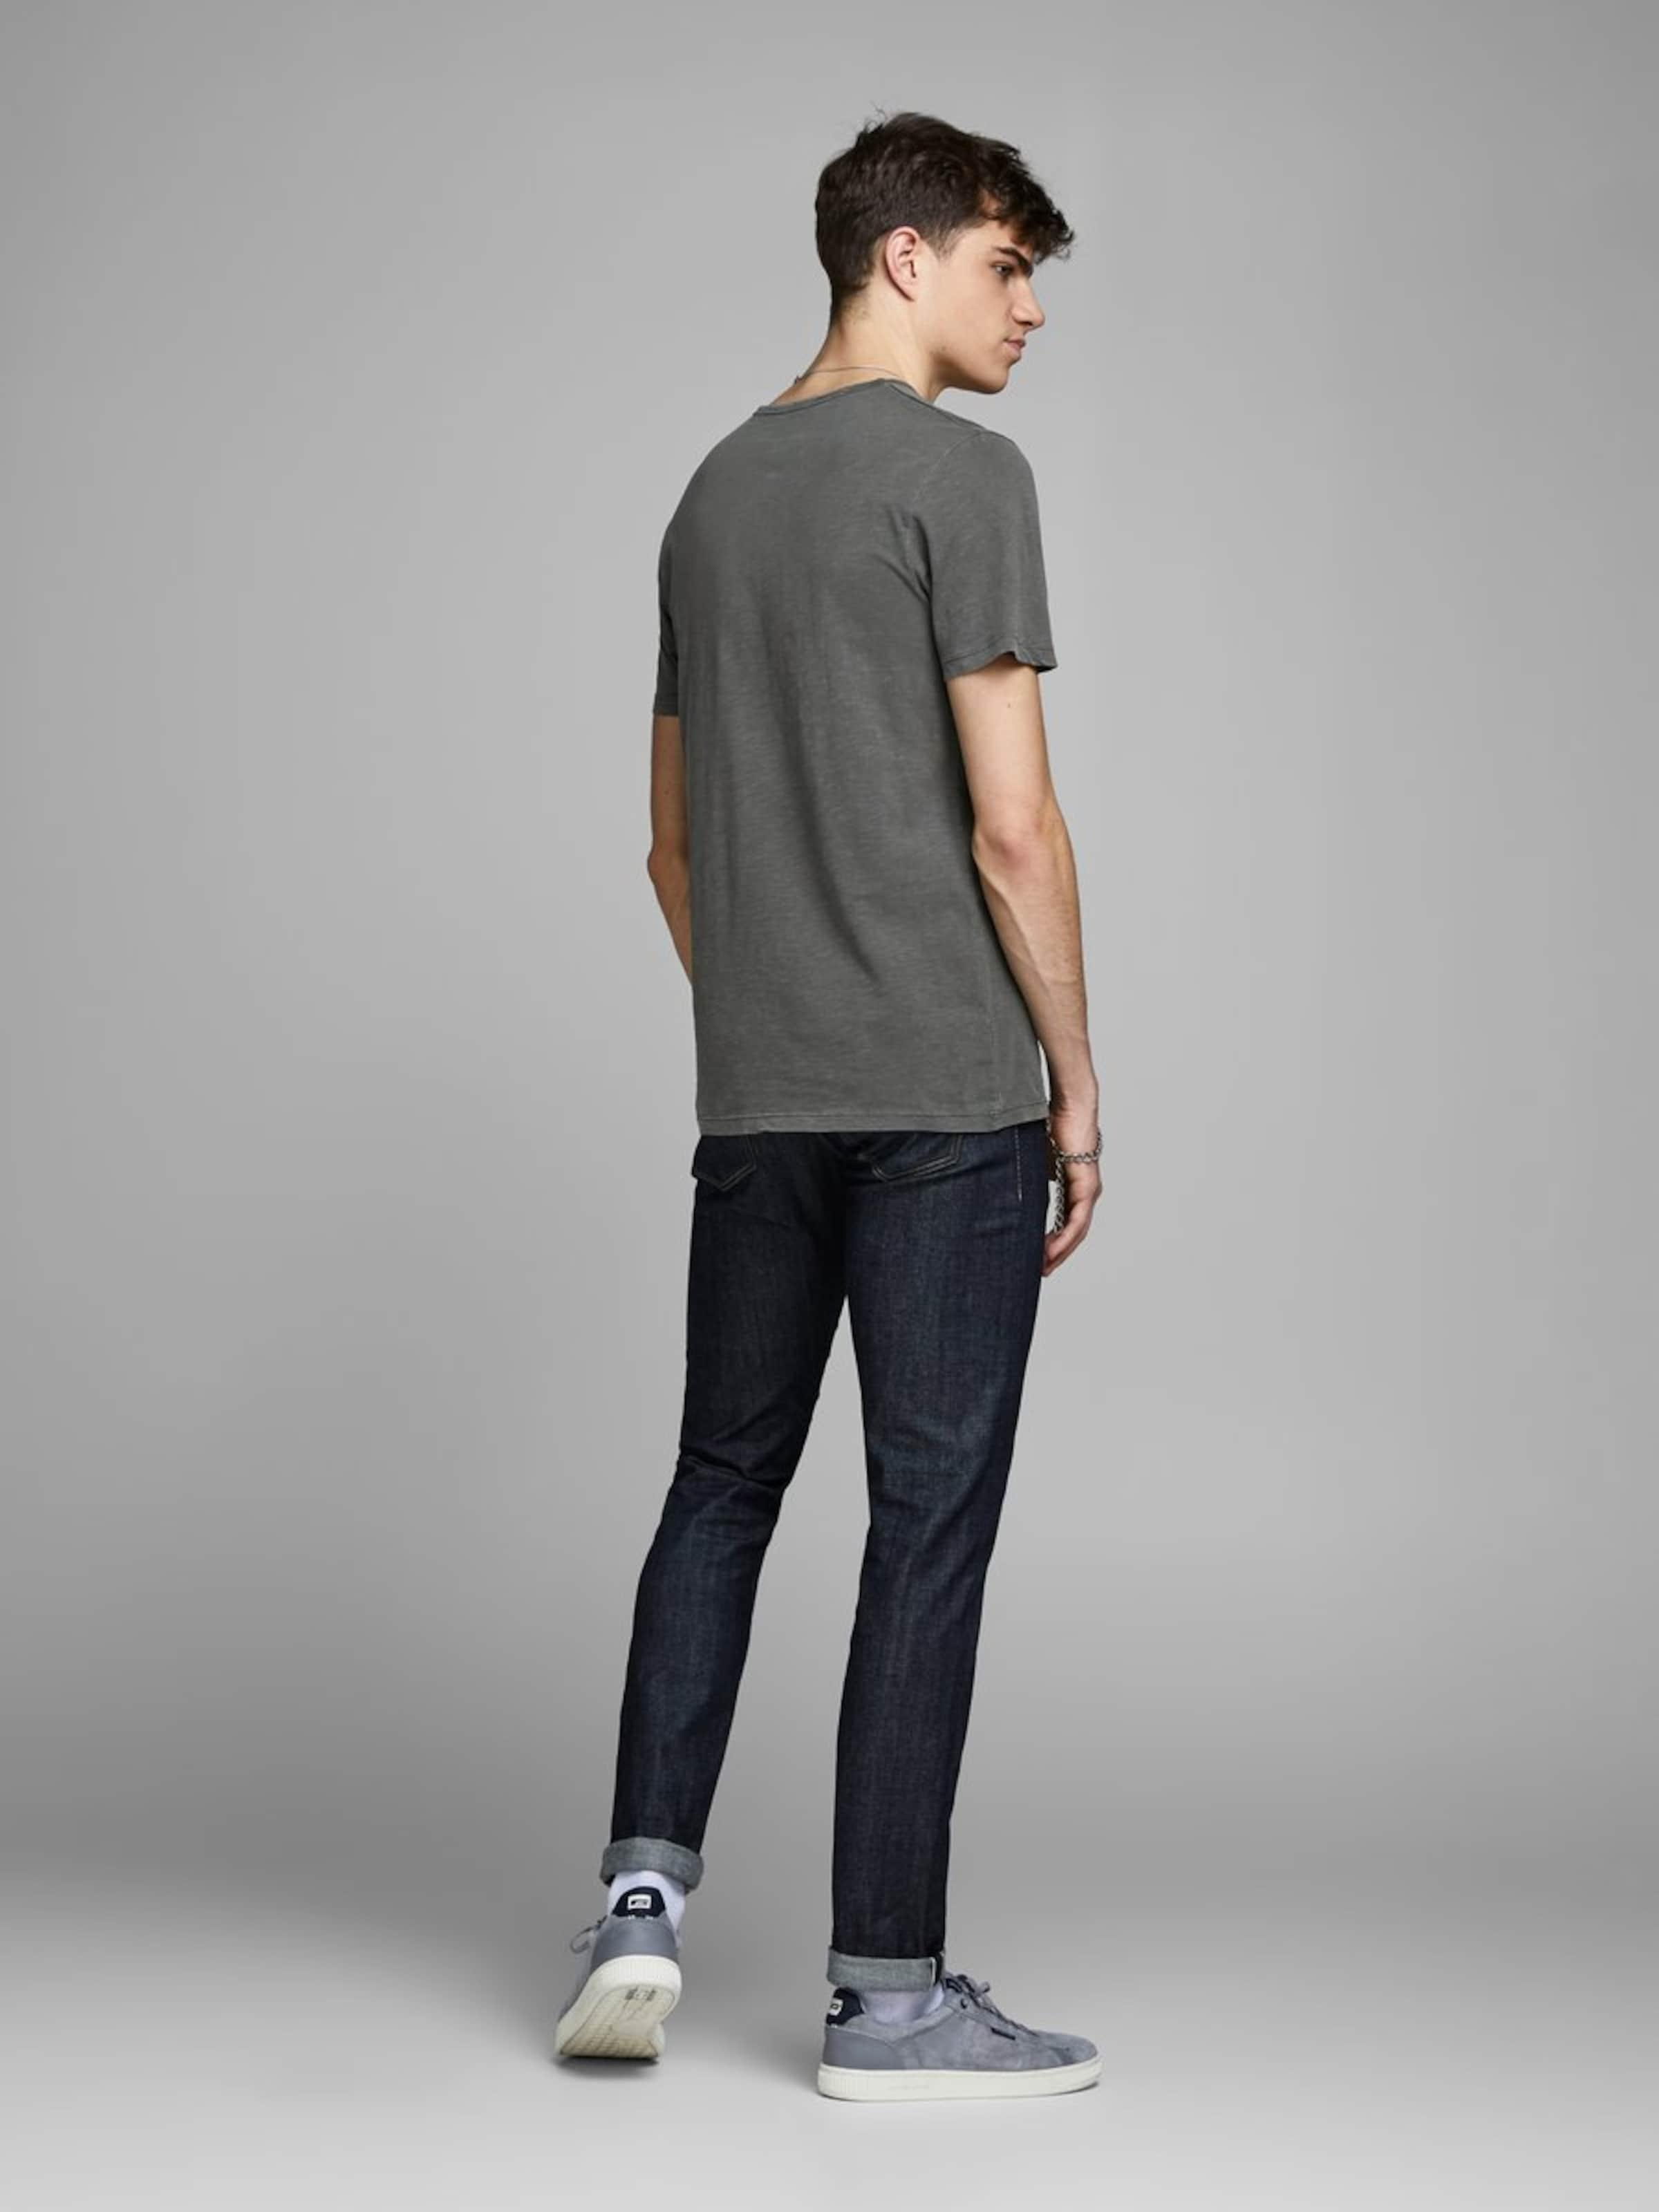 shirt Tee Split T Ss Jackamp; Jones 'jprbenjamin Neck' Rauchgrau In wXkOPZiuT